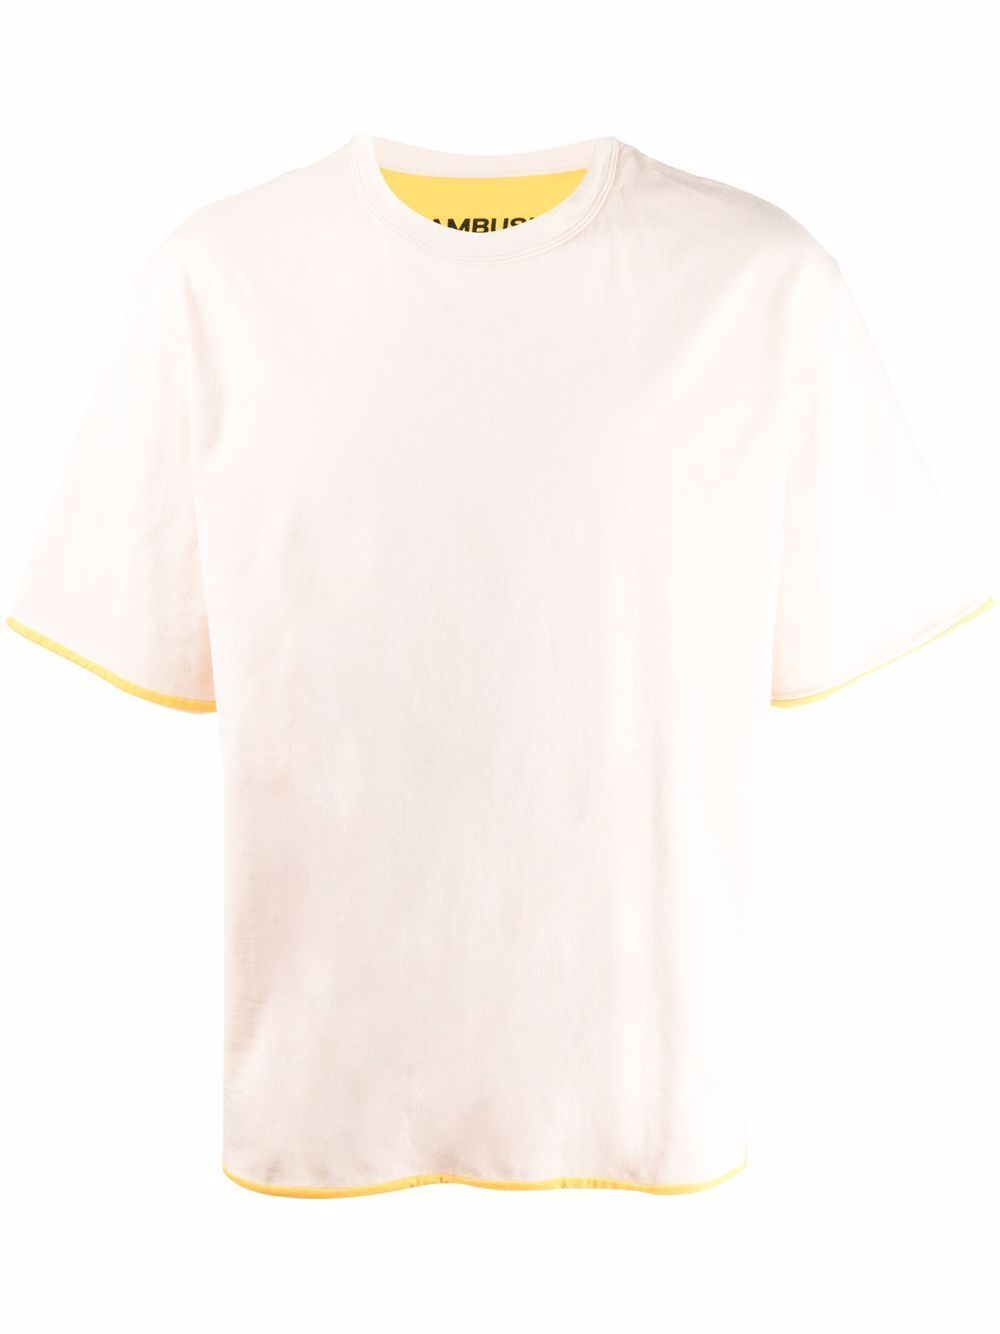 T-shirt in cotone reversibile